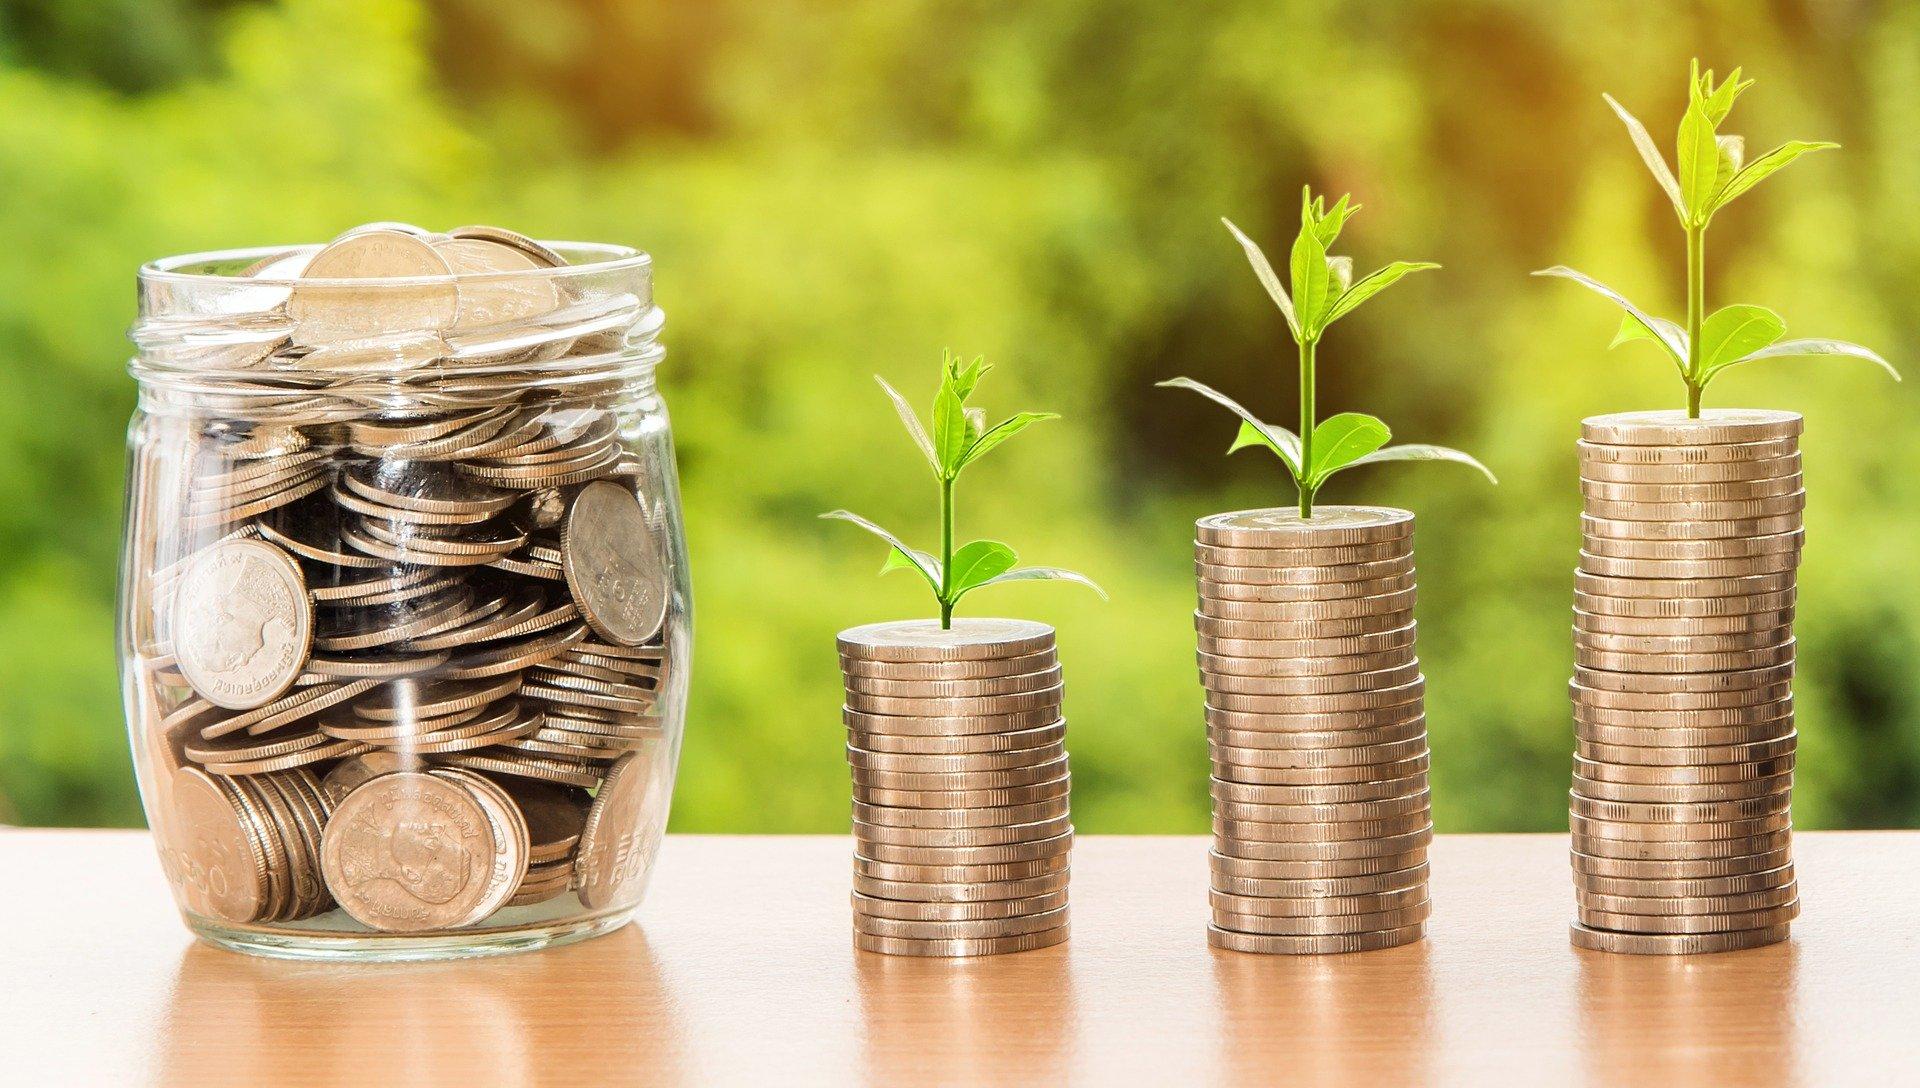 l'esprit de dépense vs l'esprit d'investissement